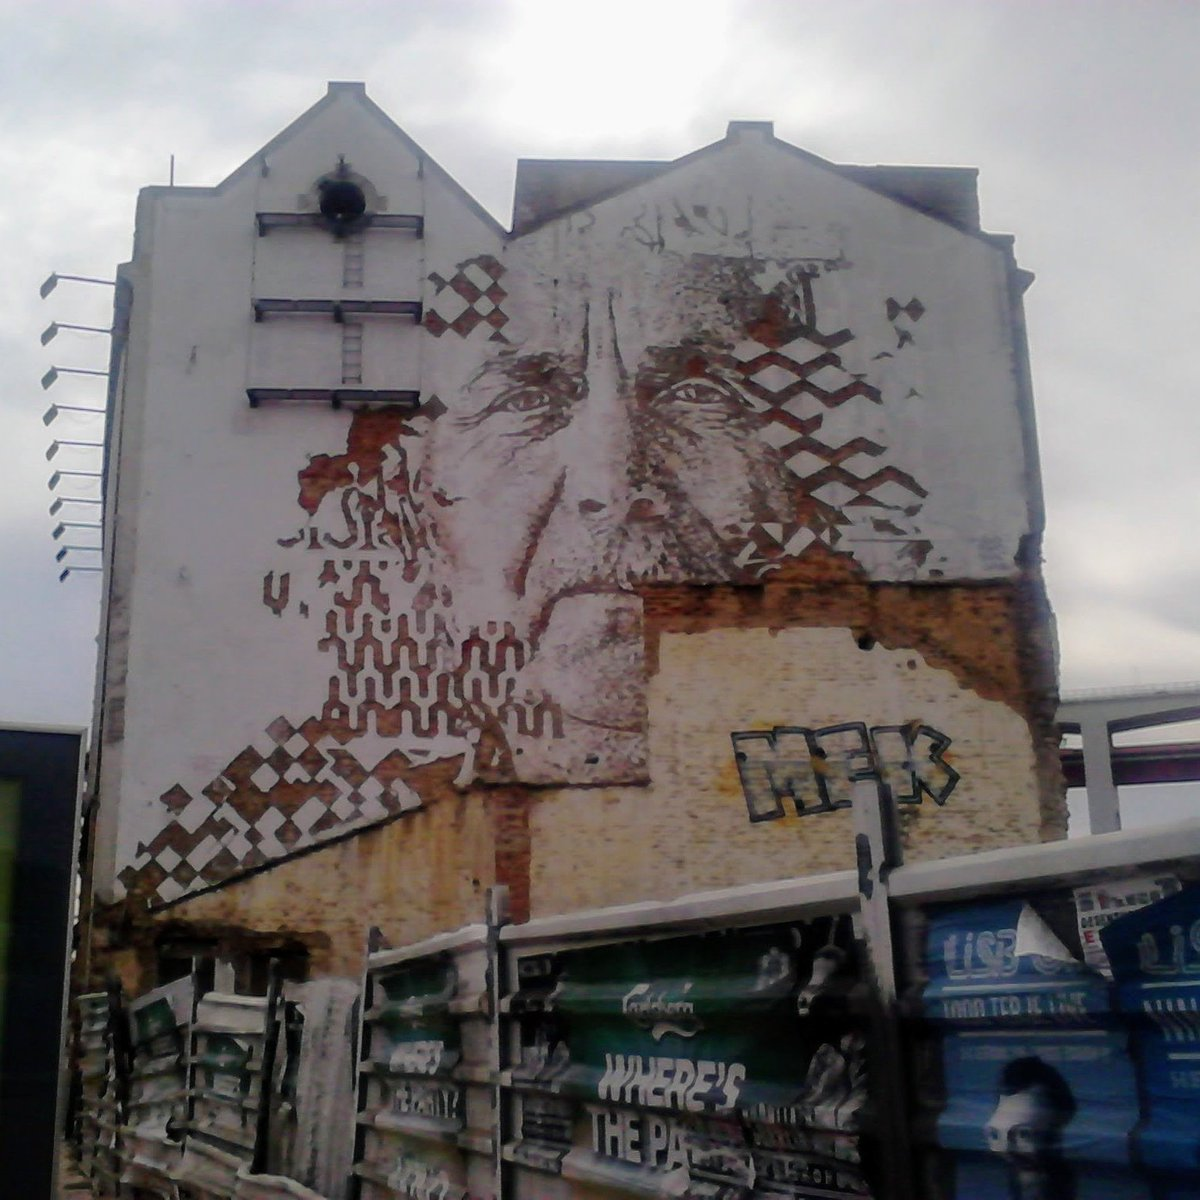 #graffiti #StreetArt #mural #GraffArt #lisbon #Portugal #face #art #photooftheday #photography #photoshoot #picoftheday #PictureOfTheDay #Lisboa #building https://t.co/0AQ9FX1XtX